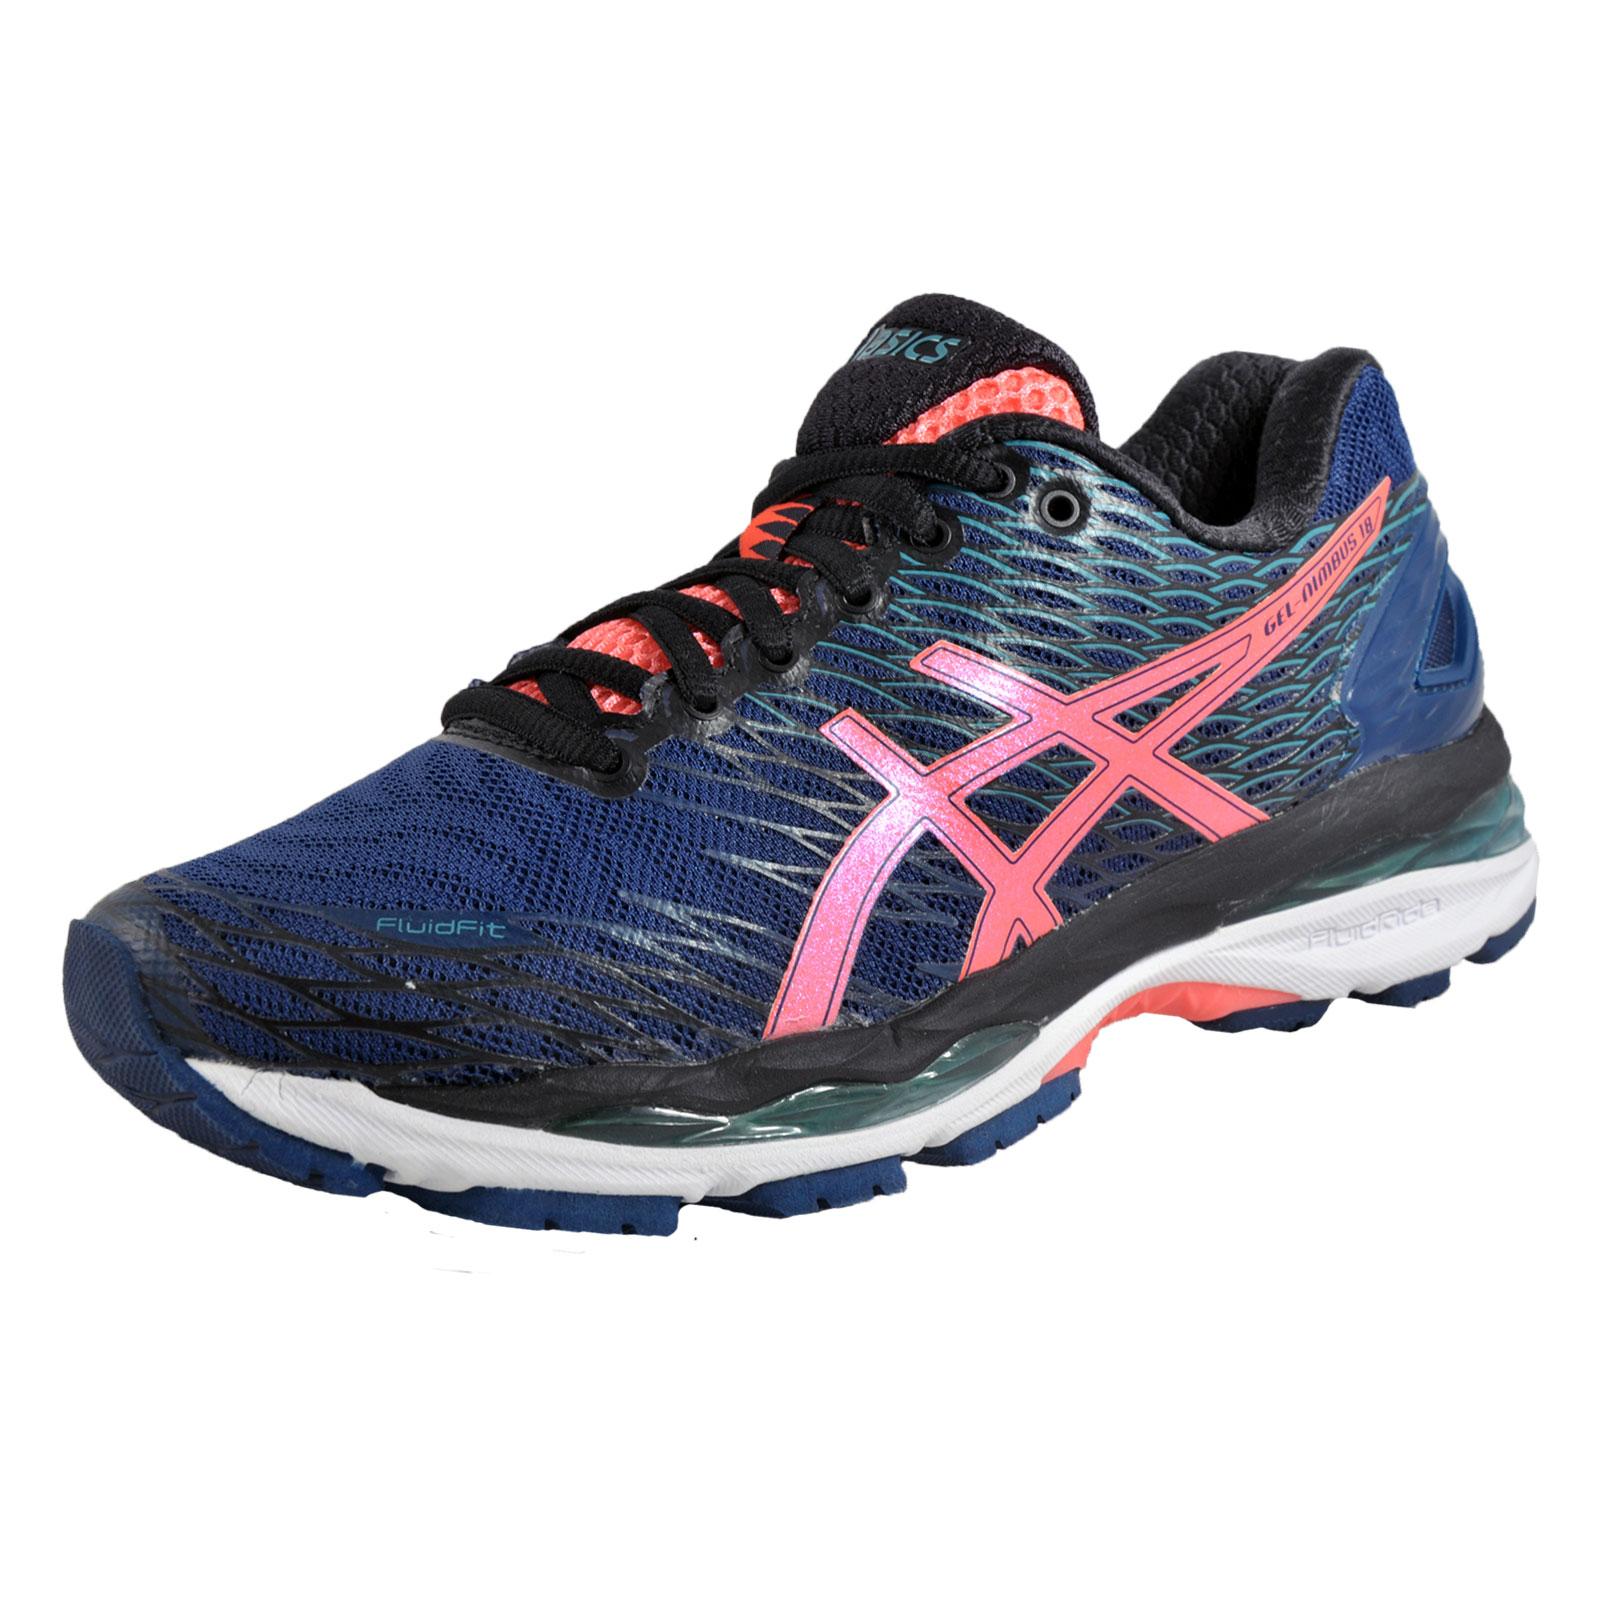 asics gel nimbus 18 womens running shoes fitness gym trainers posedion blue ebay. Black Bedroom Furniture Sets. Home Design Ideas